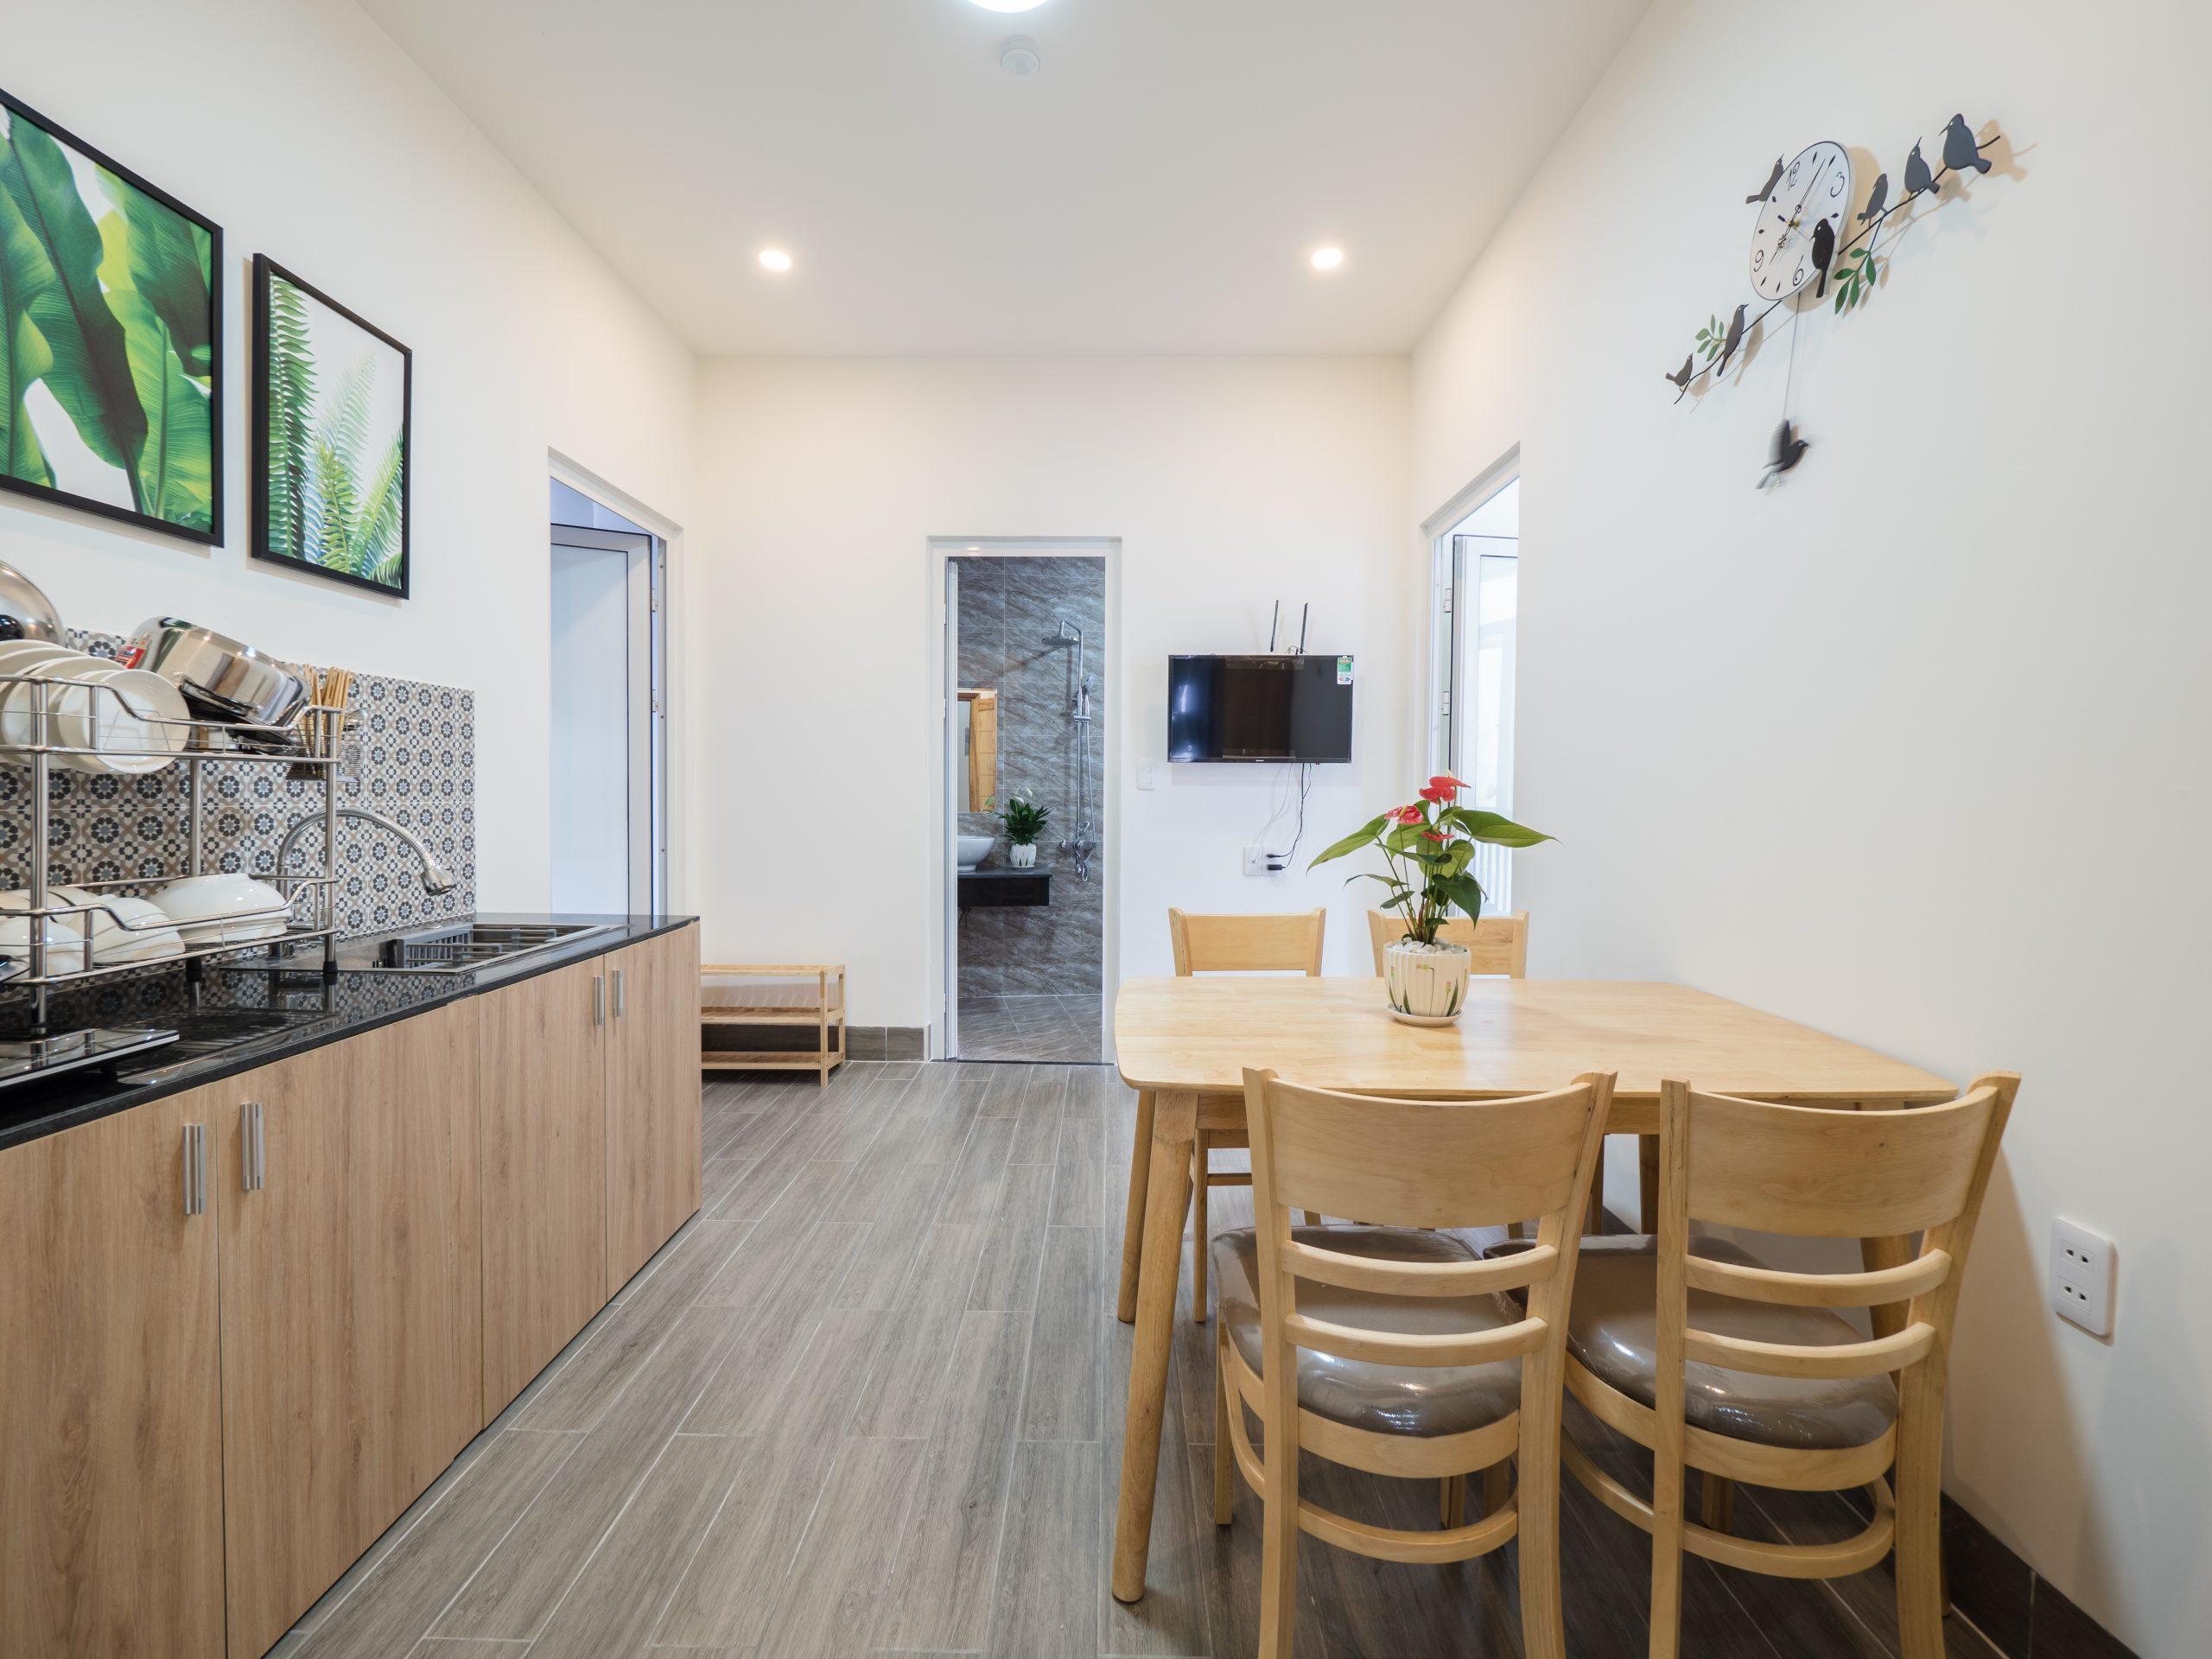 2 Bedrooms Apartment For Rent by Han River/ Novotel Da Nang